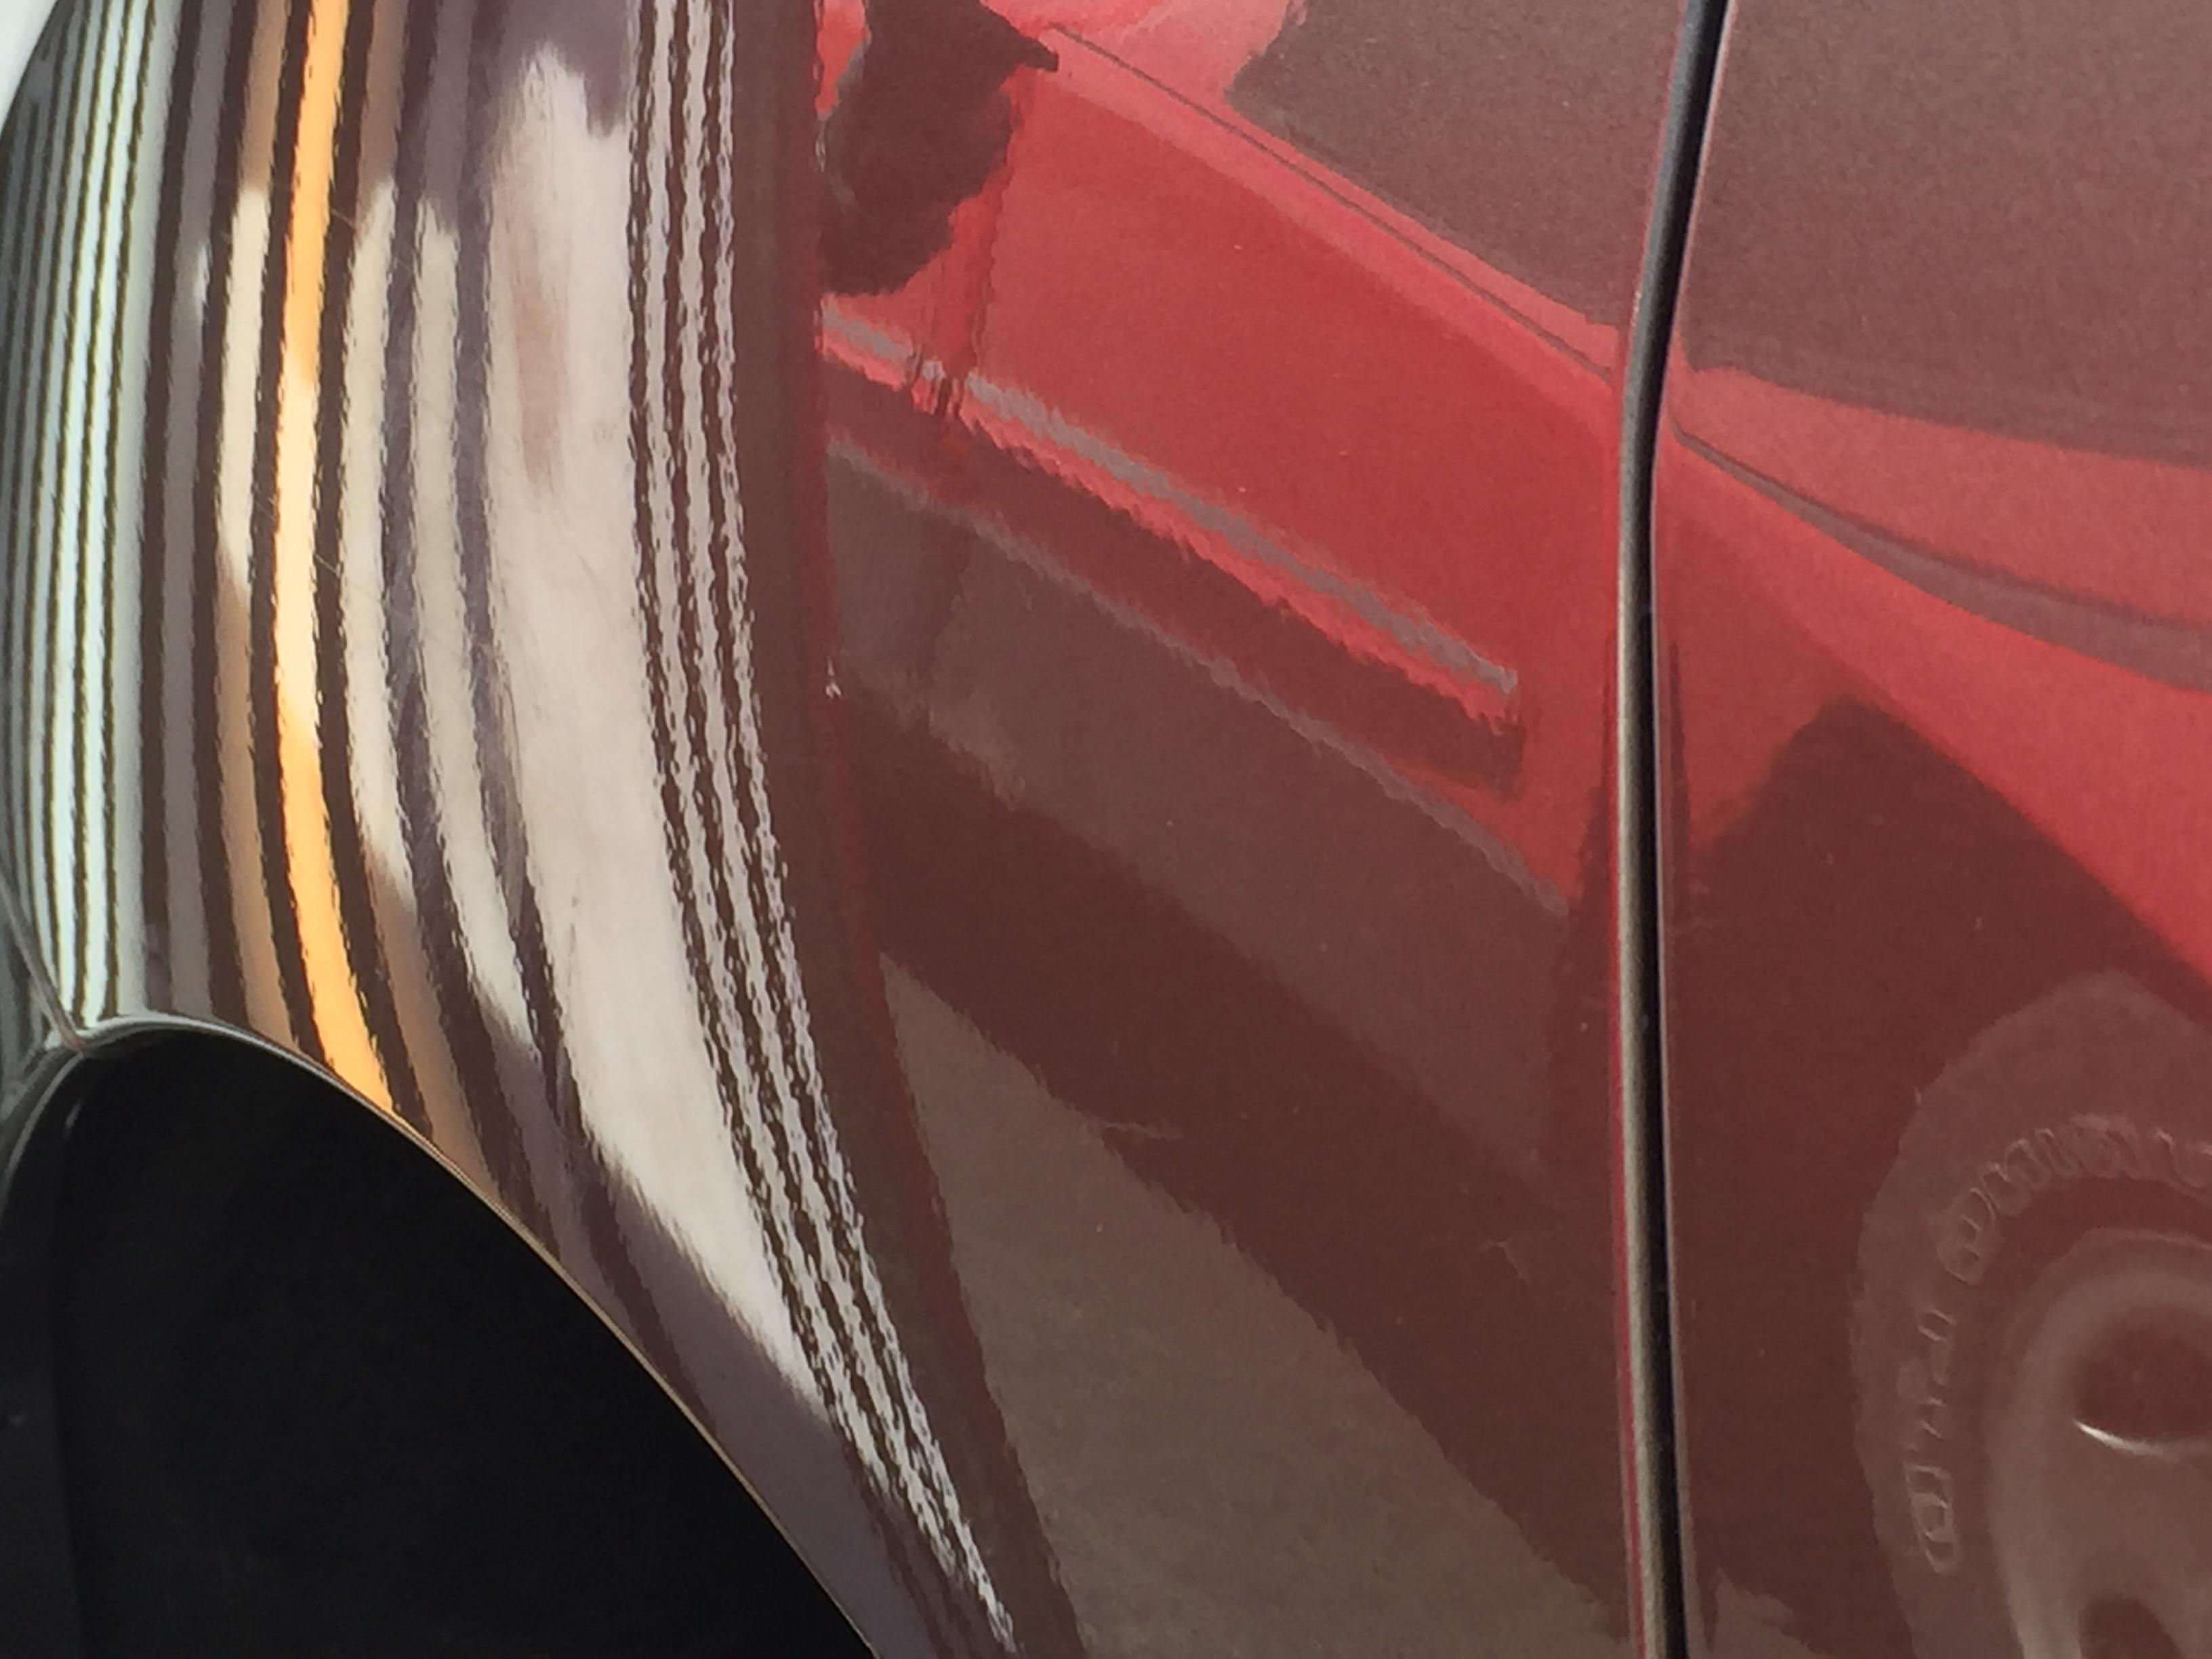 2012 Nissan Murano Rear Quarter Dent Repair, Paintless Dent Removal, http://217dent.com